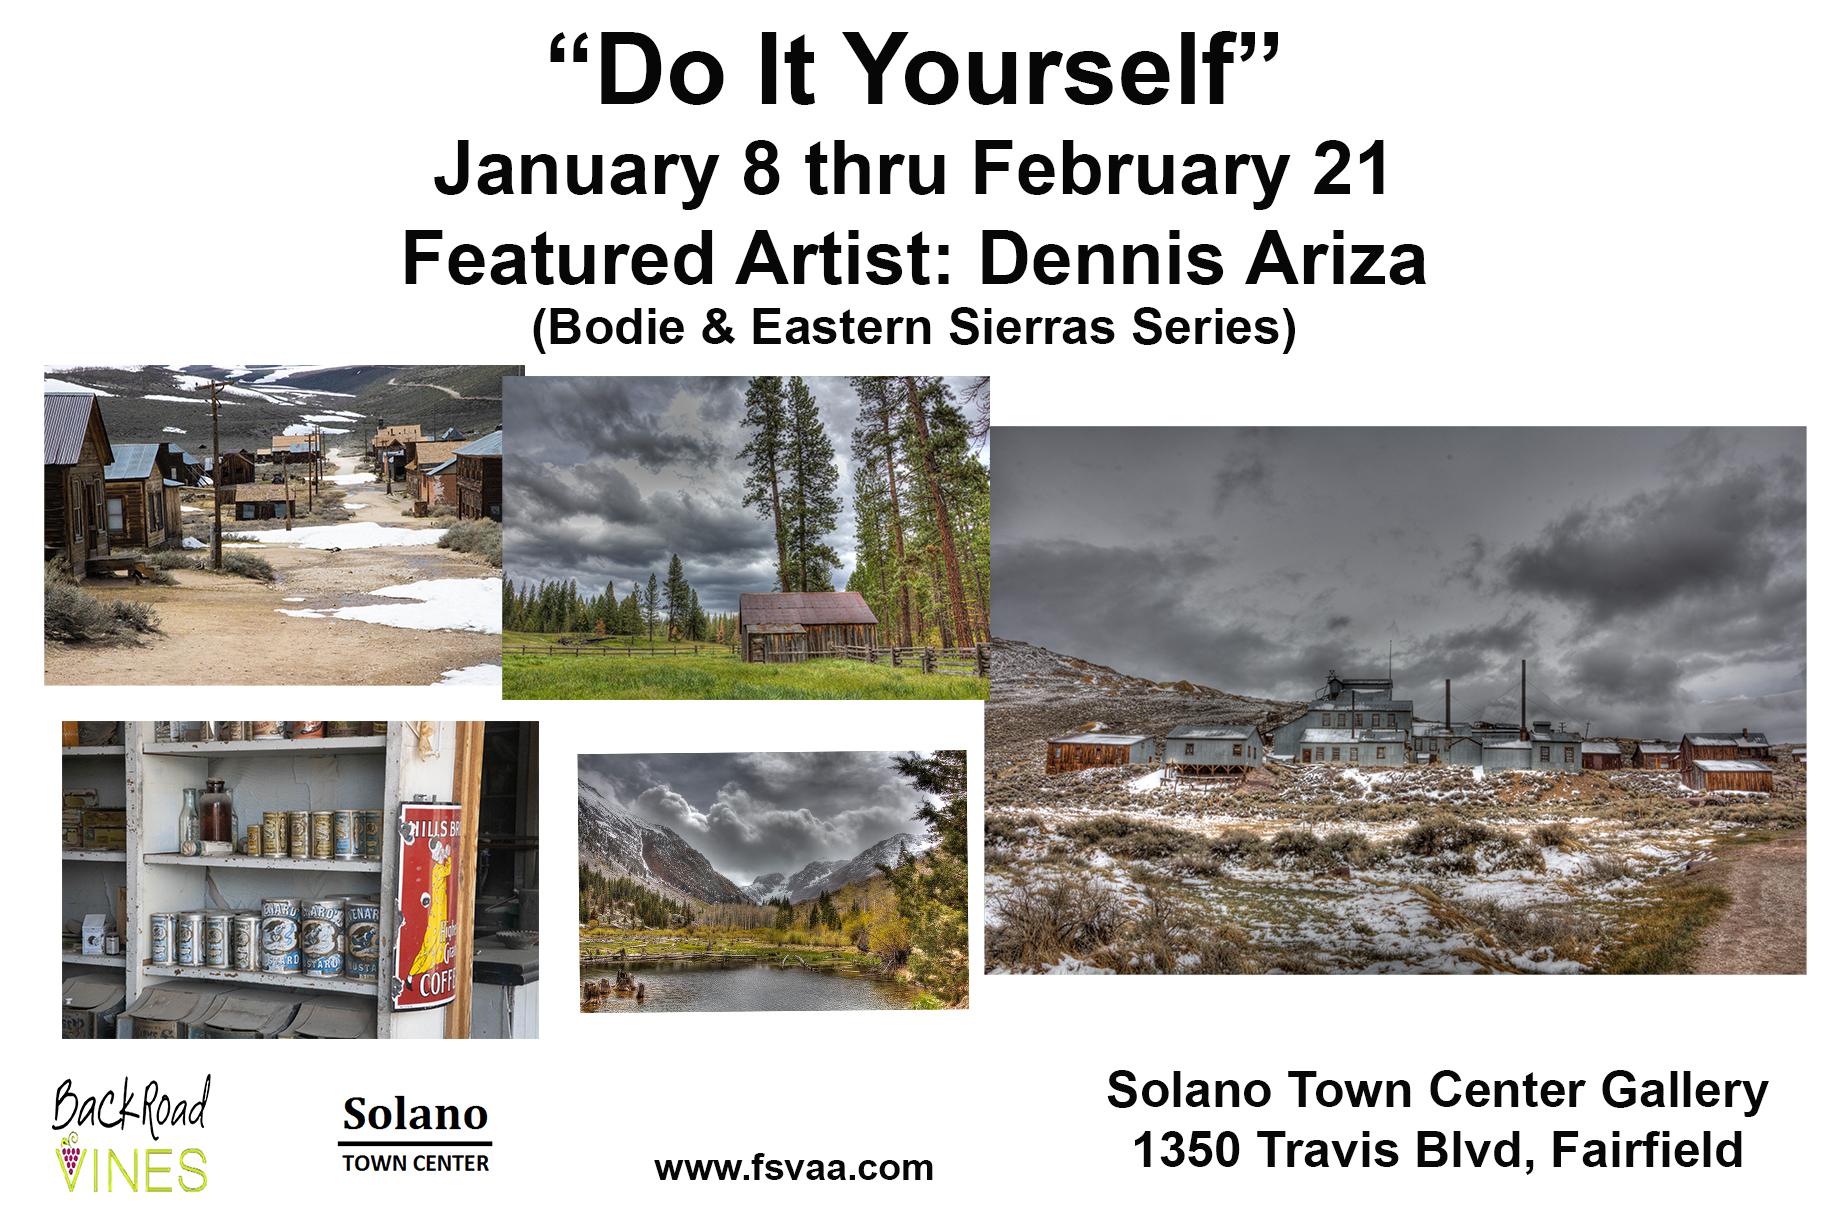 Dennis Ariza Do It Yourself Postcard